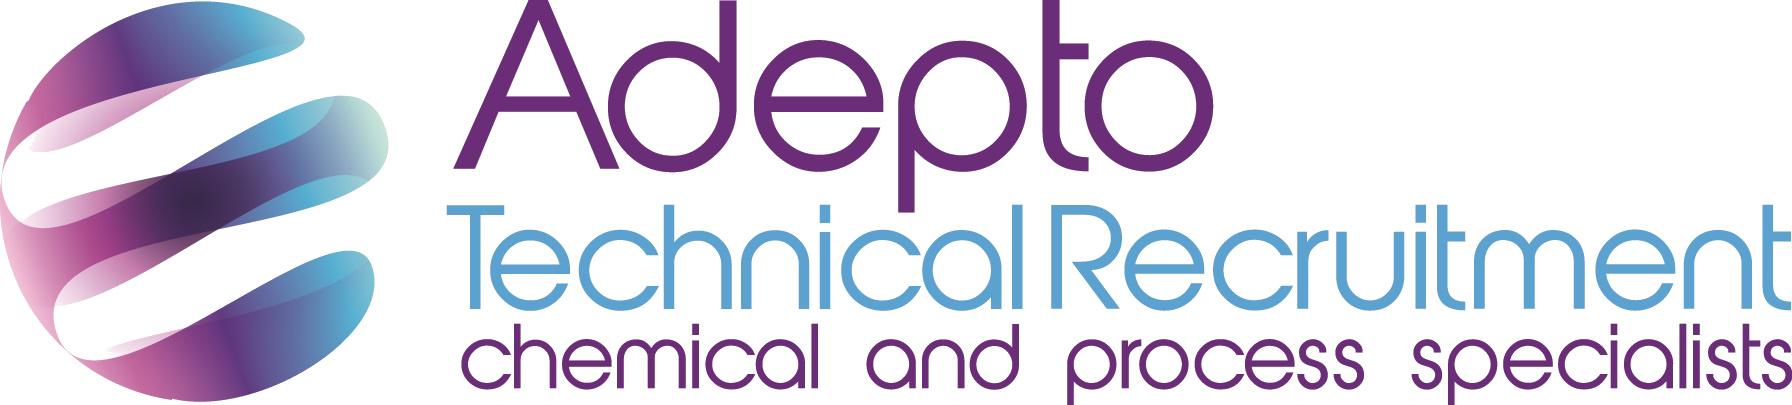 Adepto Technical Recruitment